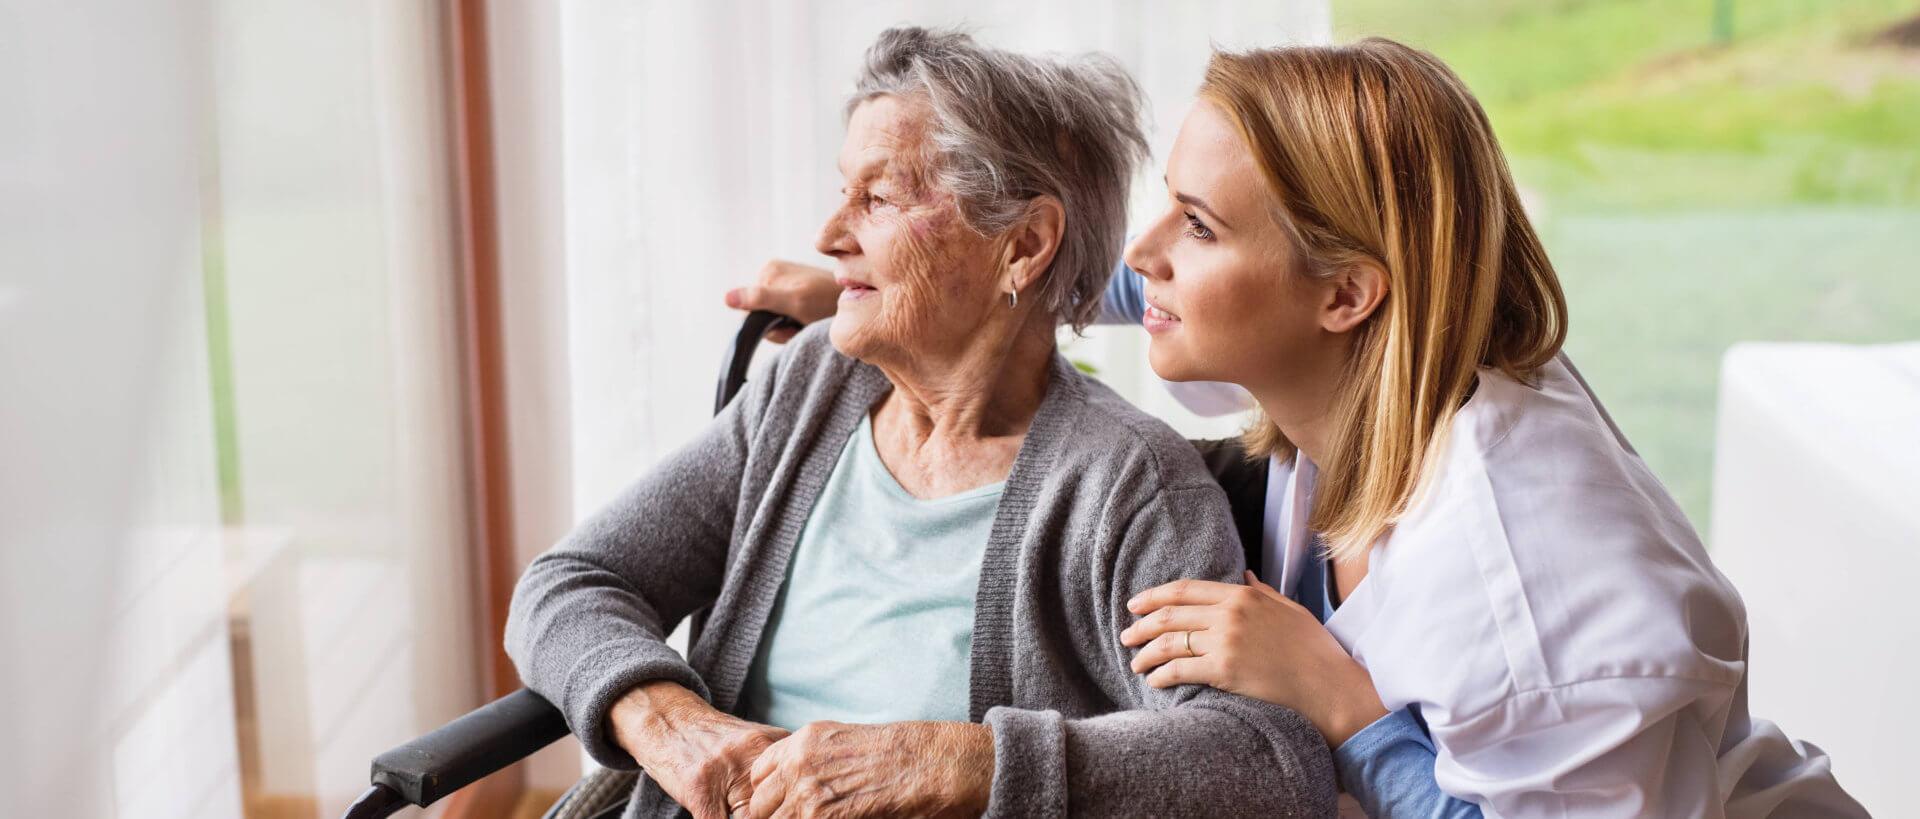 caregiver and senior woman looking at something